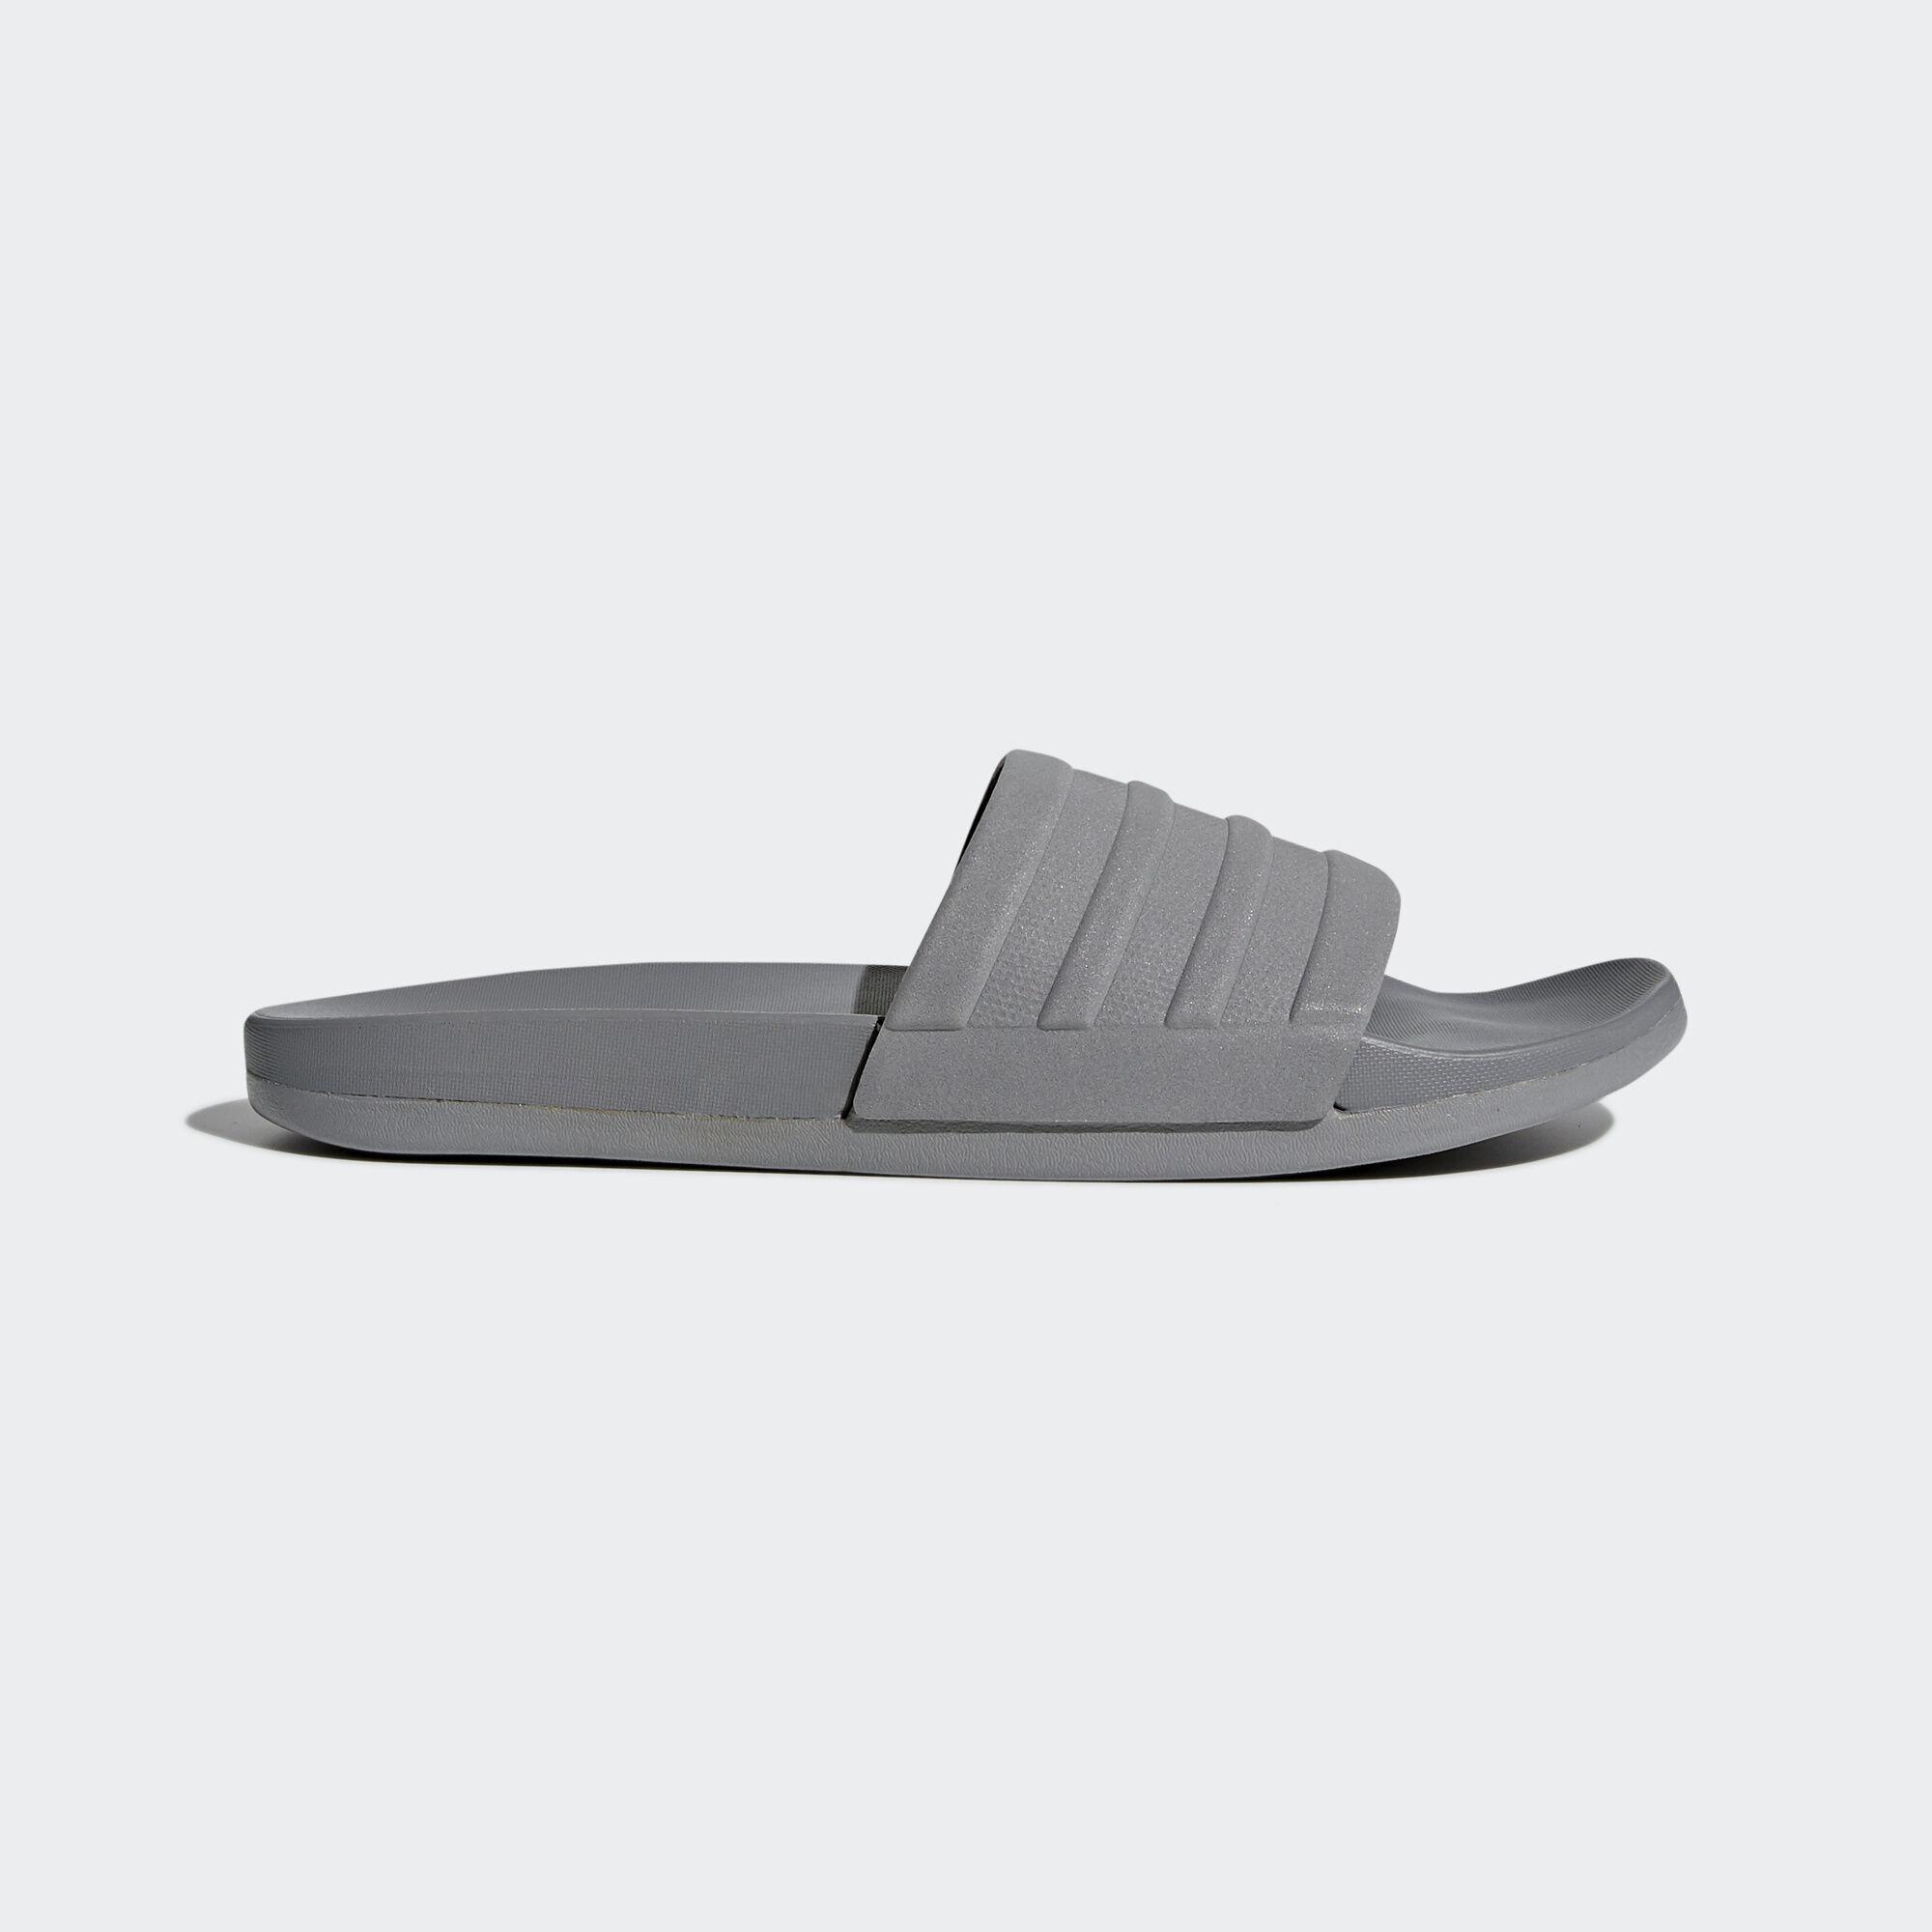 e9eac3440c11 adidas adilette Cloudfoam Plus Mono Slides - Grey